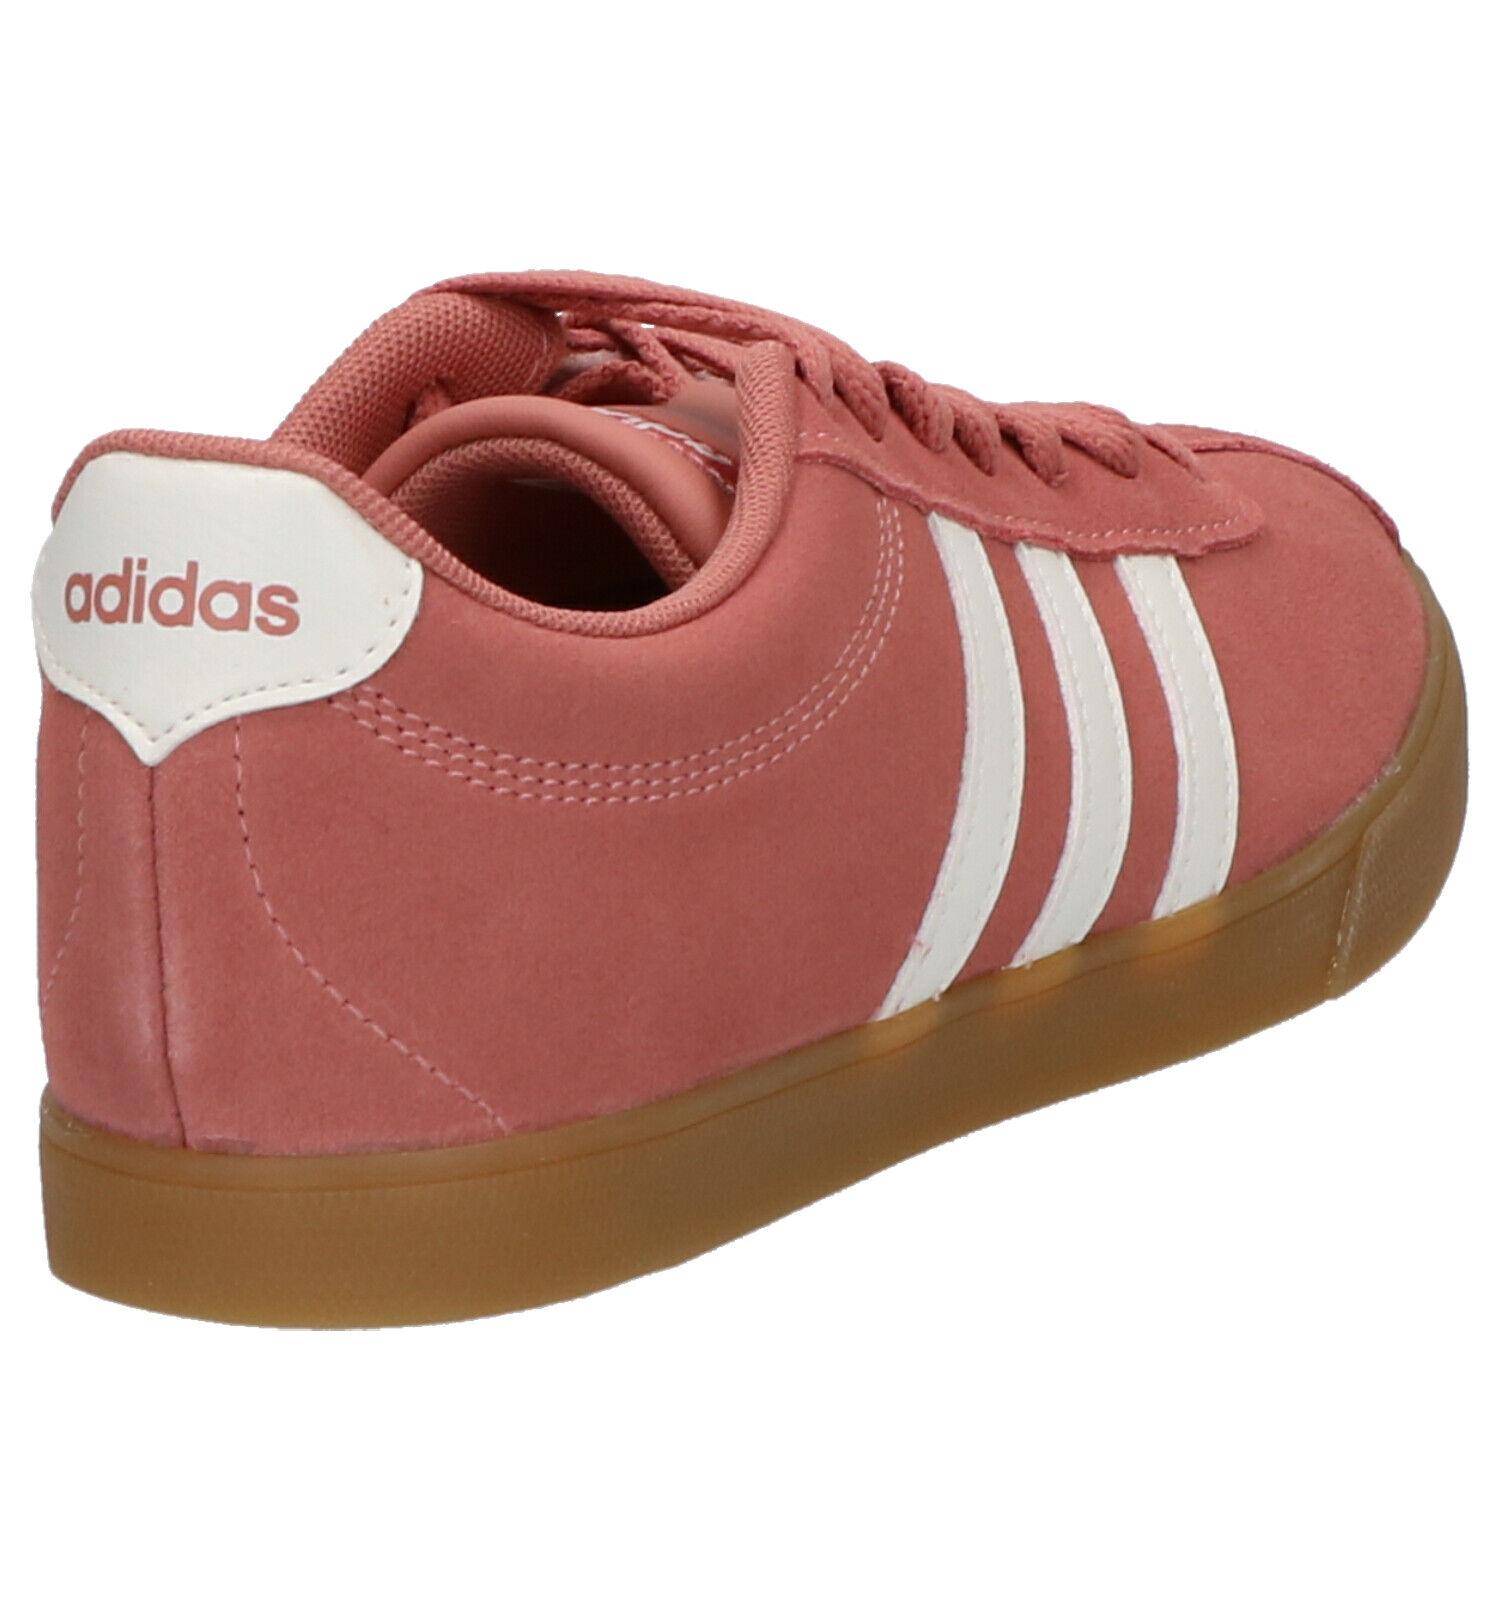 adidas Courtset Roze Sneakers